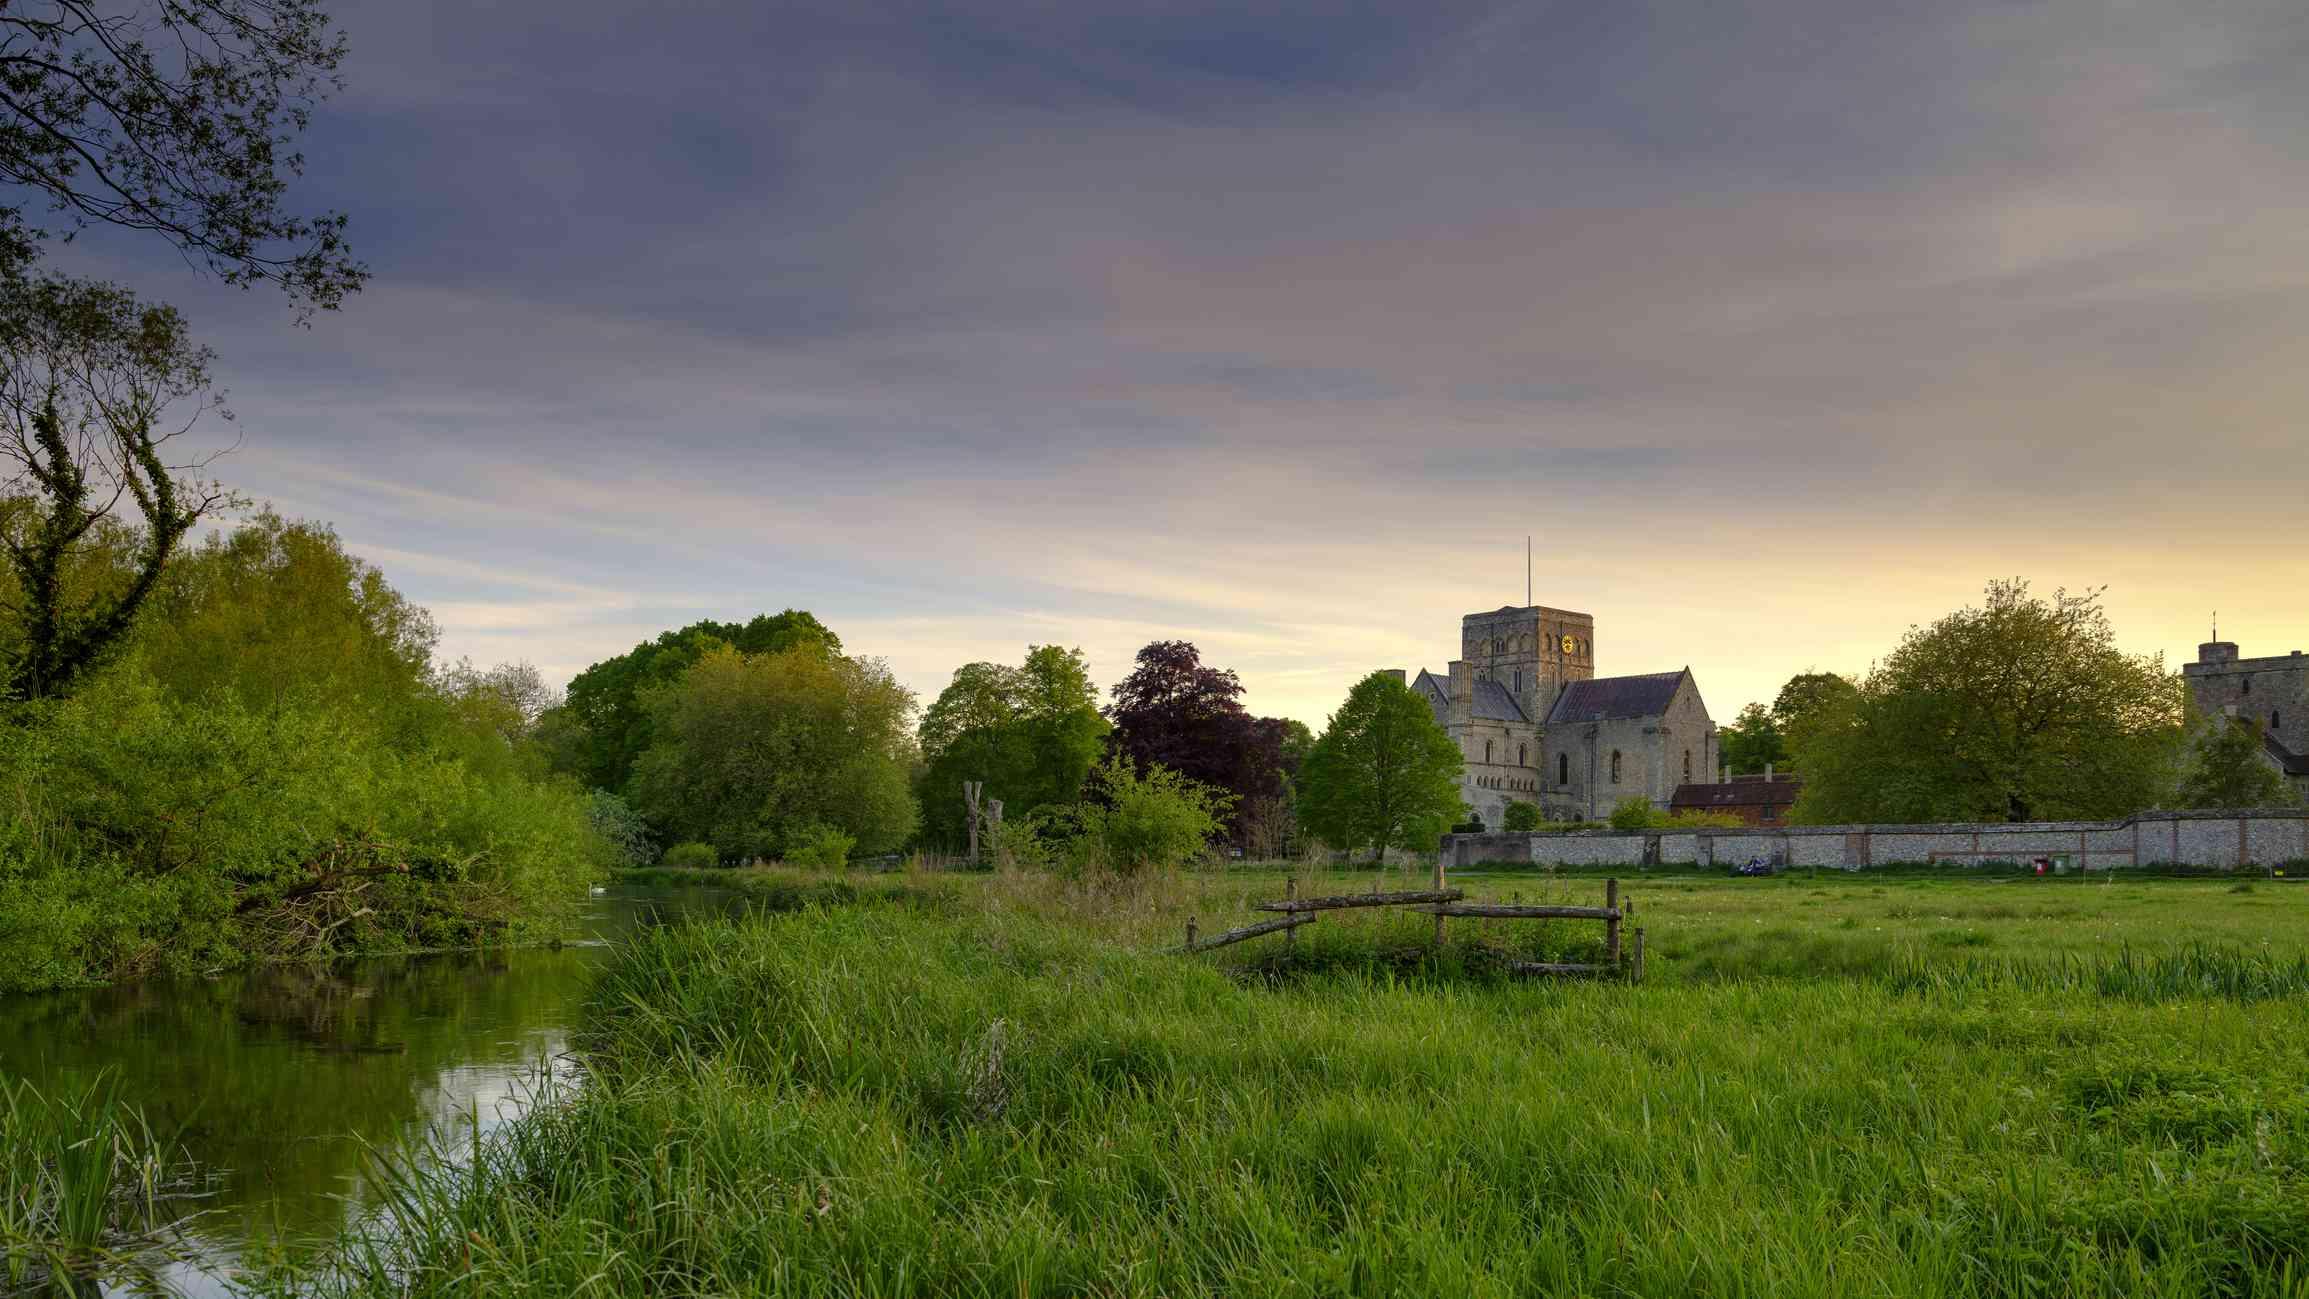 Spring sunset over St Cross Hospital, Winchester, Hampshire, UK